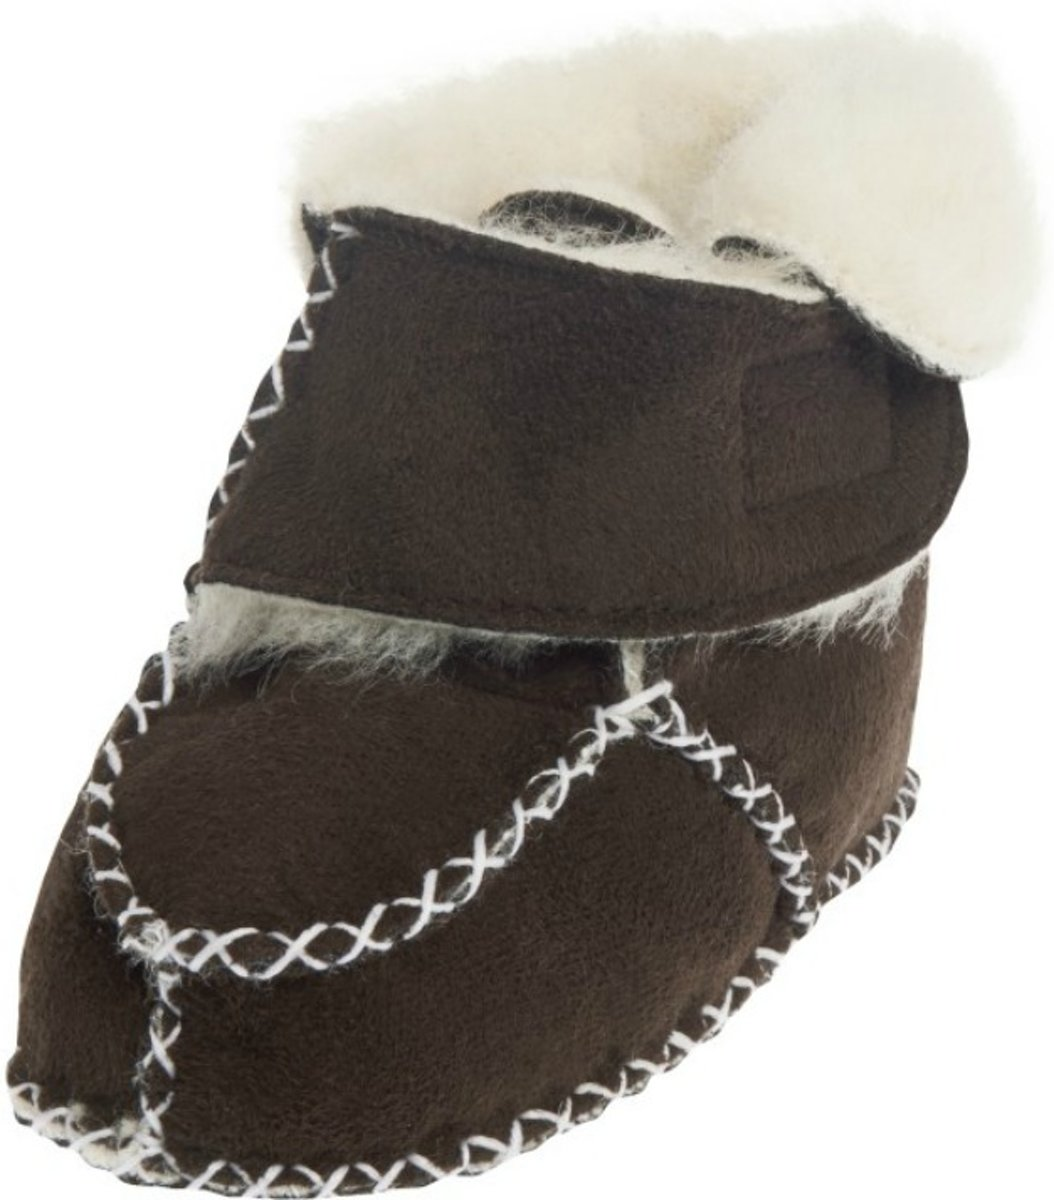 Playshoes babyslofjes klittenband donkerbruin kopen